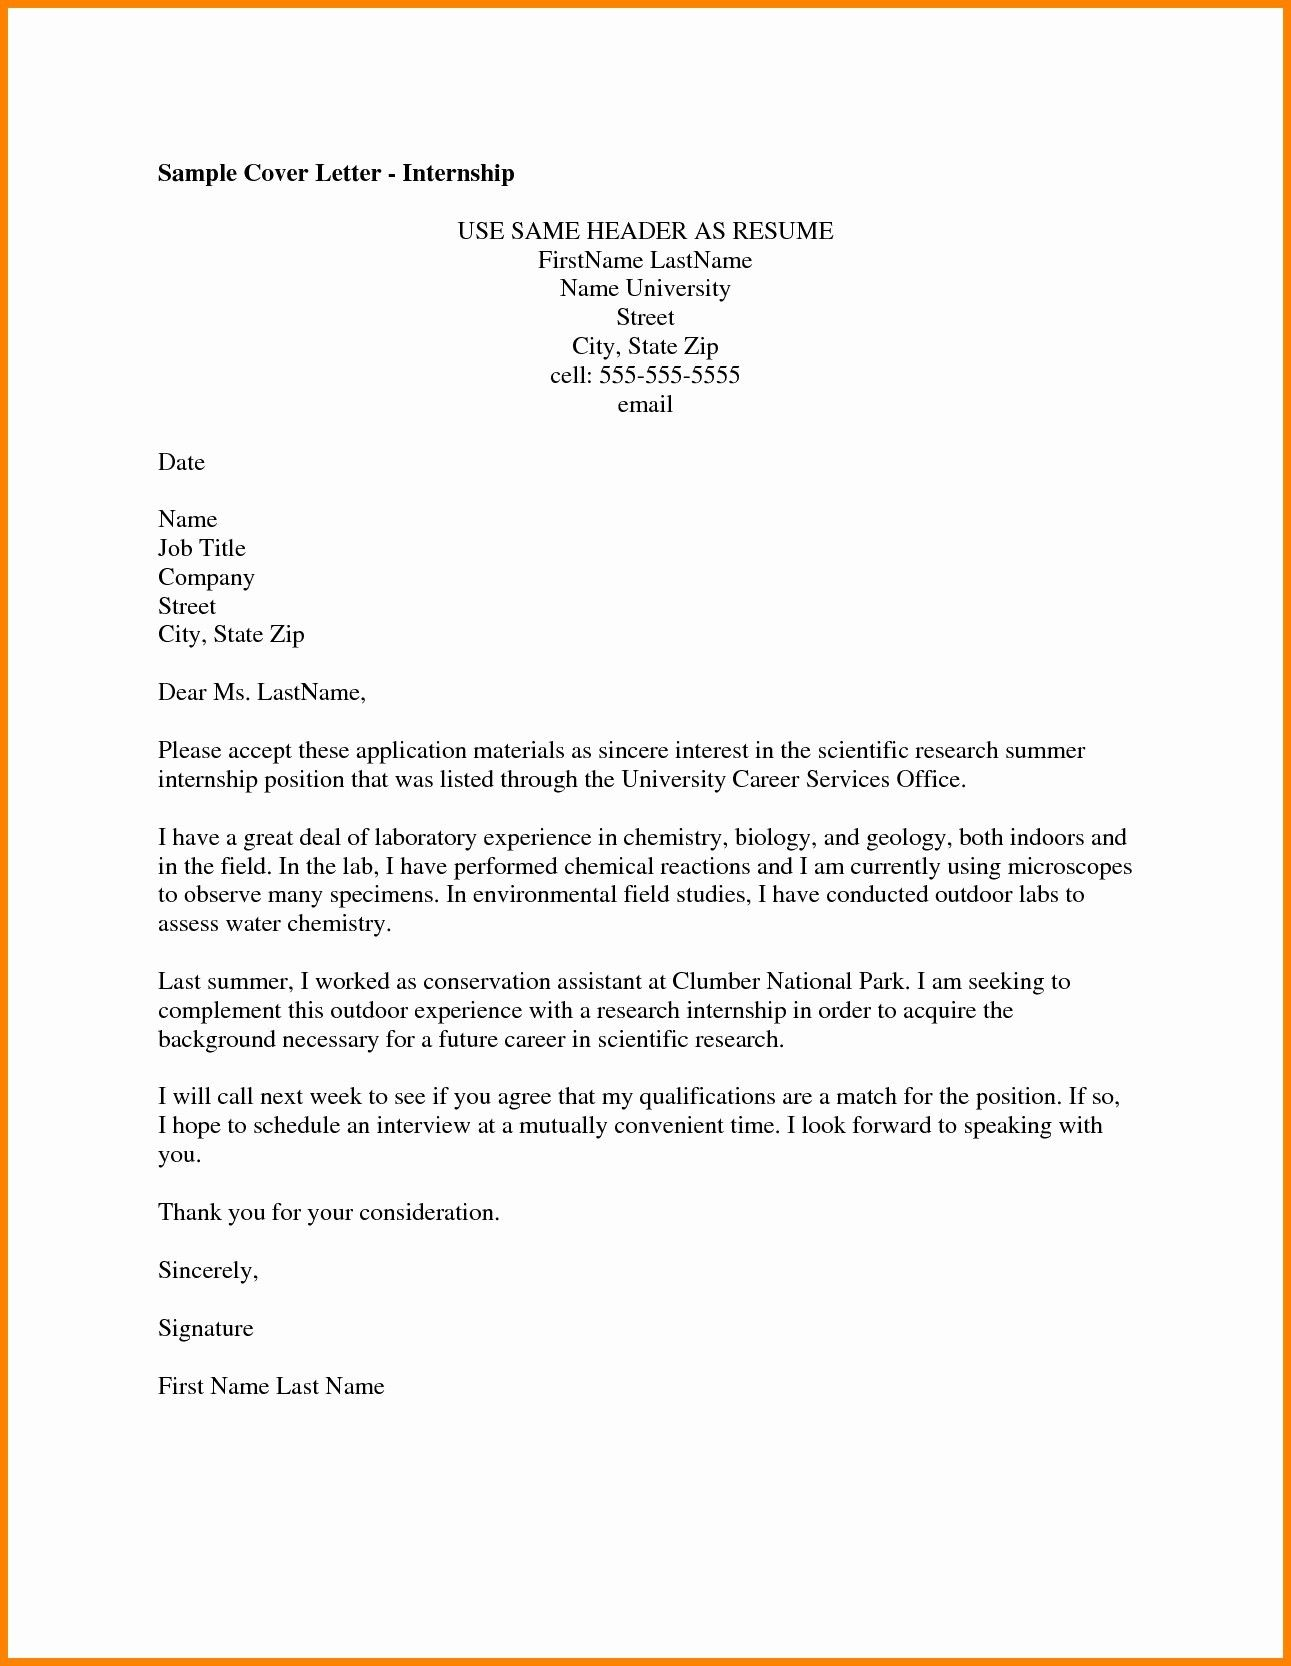 Confortable Resume Applying For Internship In Cover Letter For